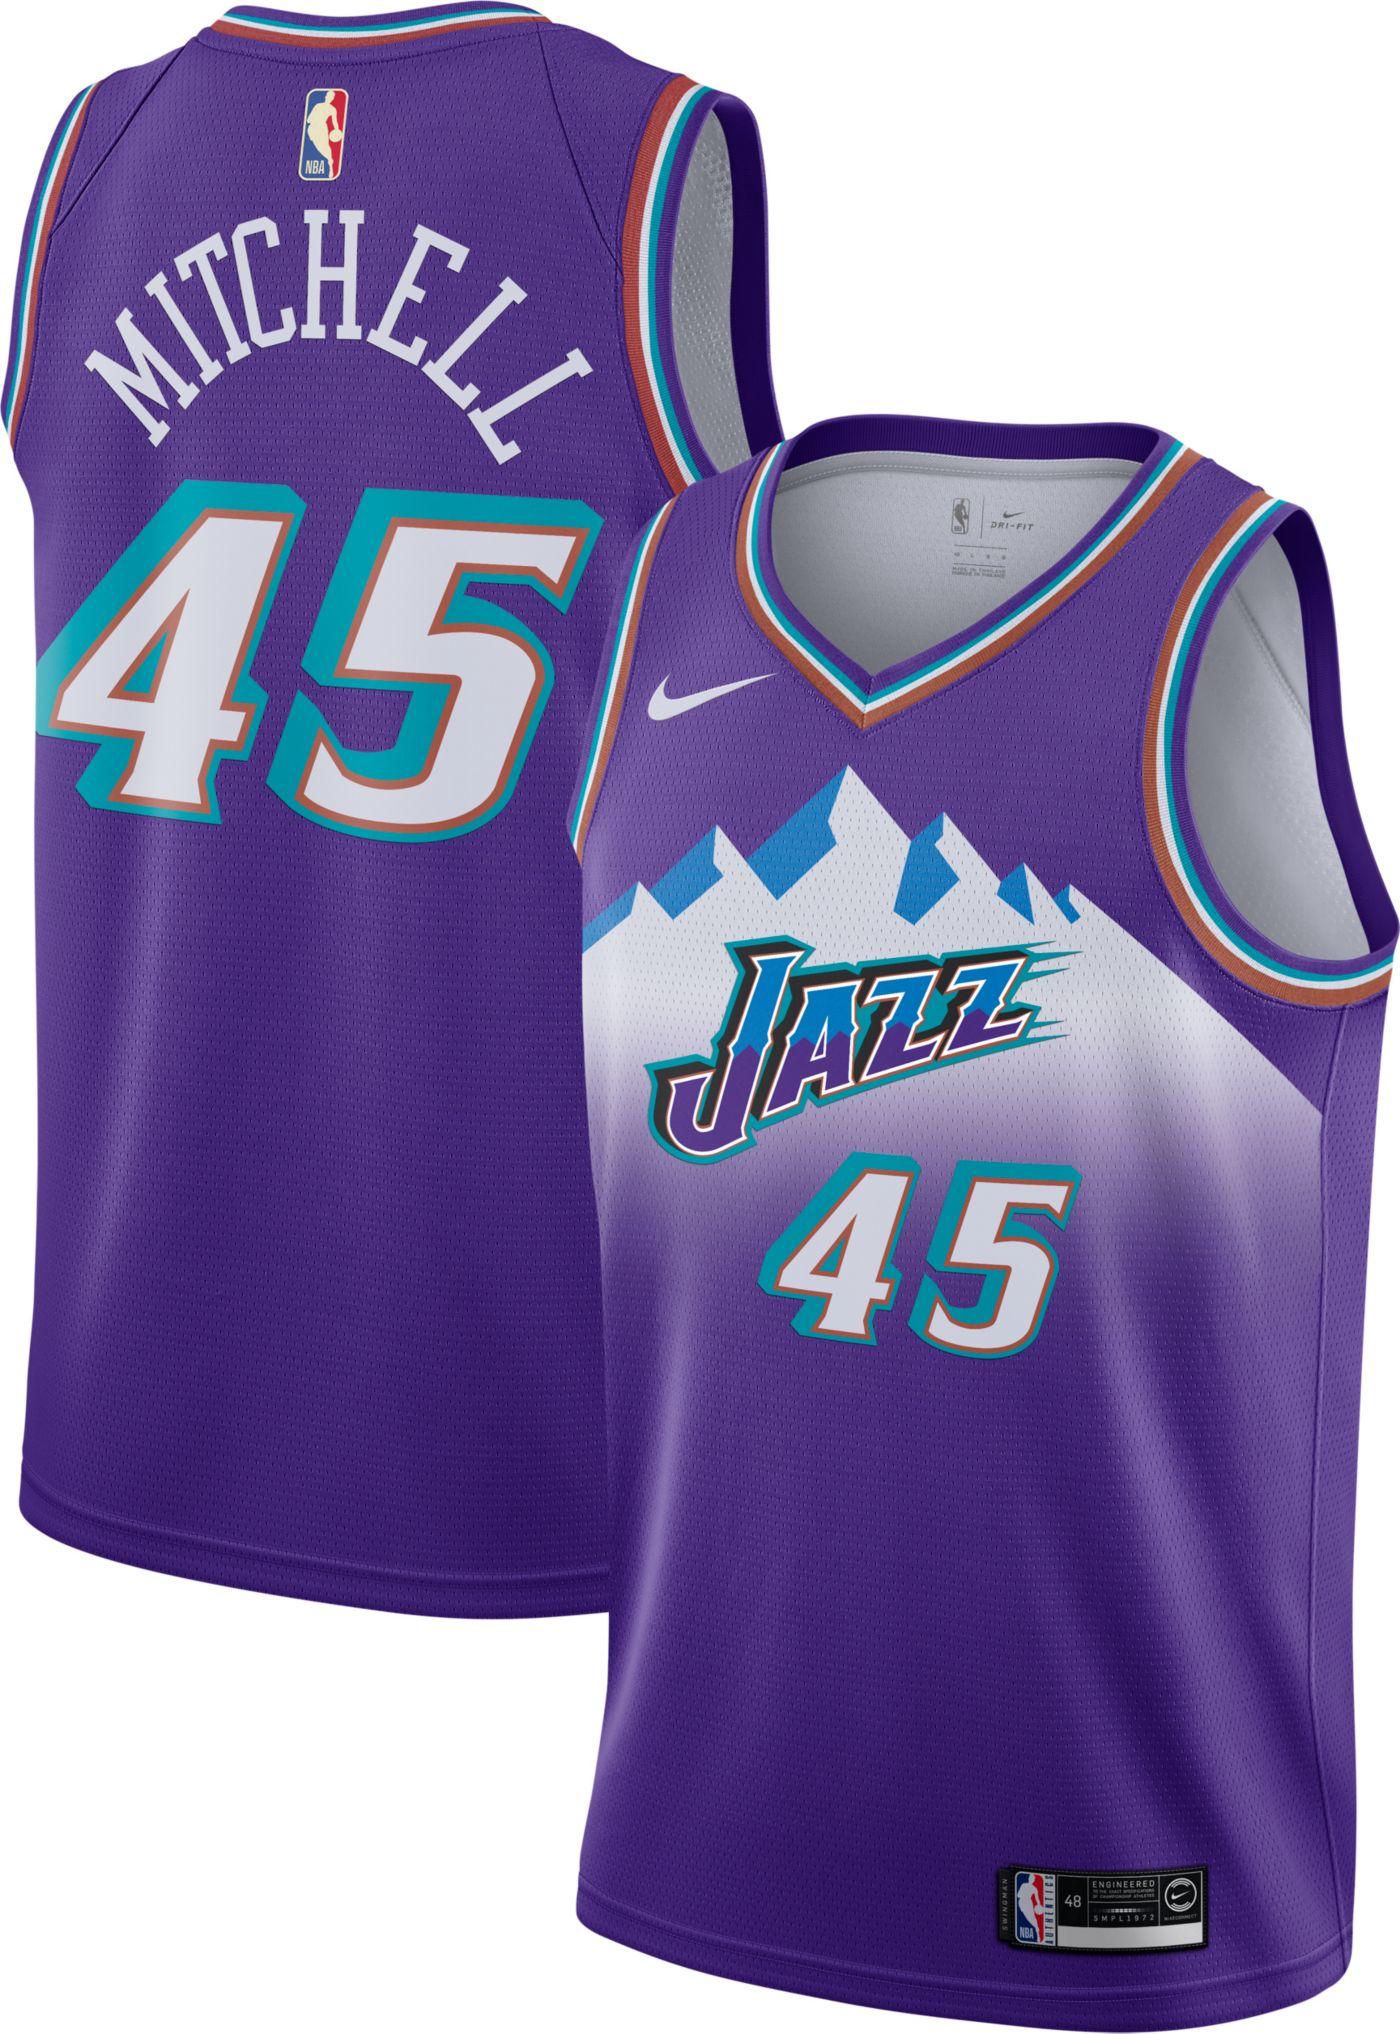 Nike Men's Utah Jazz Donovan Mitchell #45 Hardwood Classic Dri-FIT Swingman Jersey